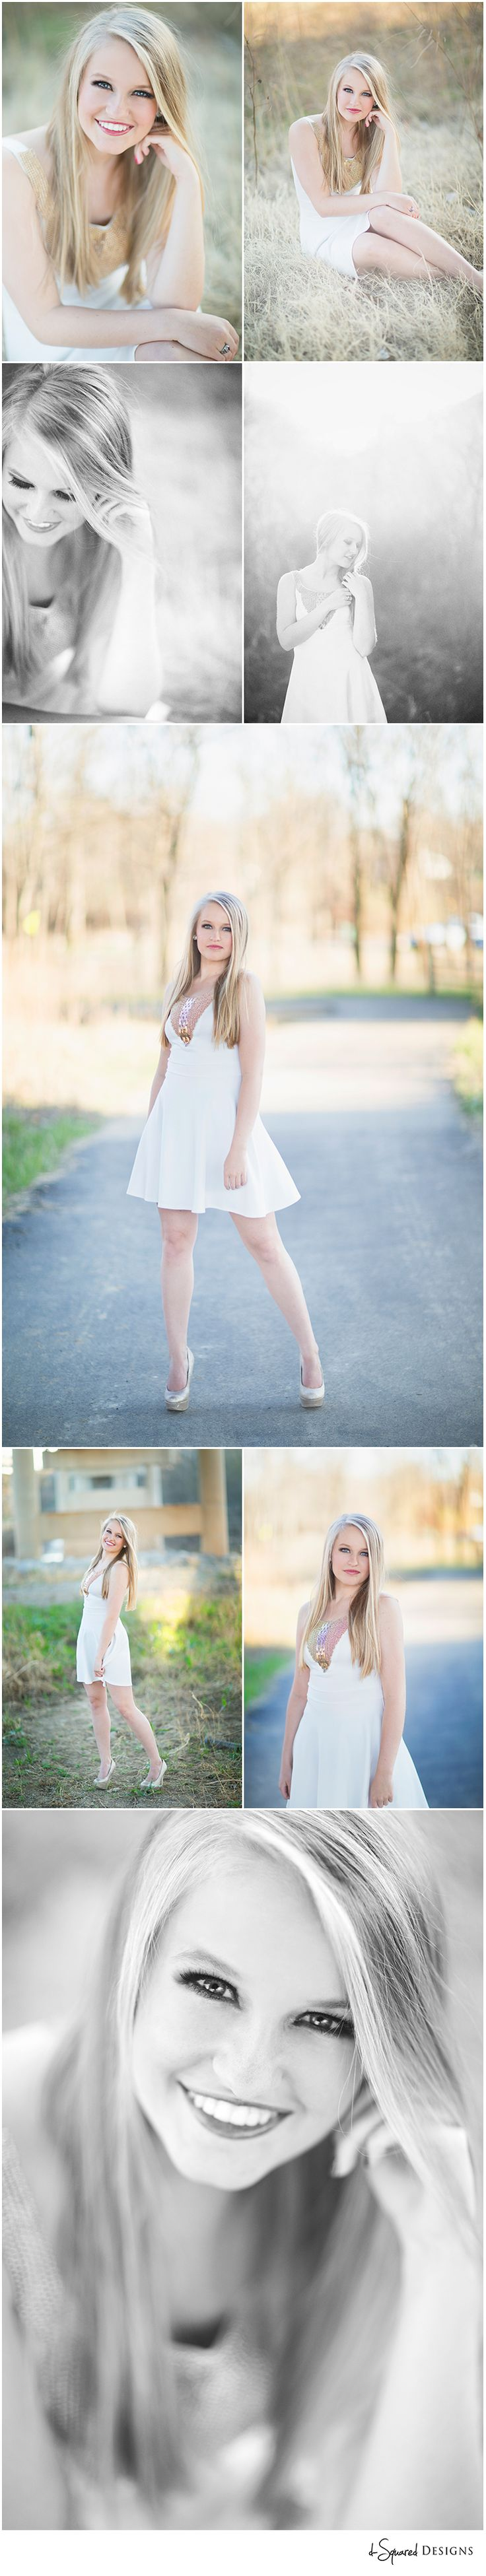 d-Squared Designs Missouri Senior Photography. Spring senior session. Senior girl photography. Senior girl posing. Pretty girl. Blonde girl. White dress. Soft images.